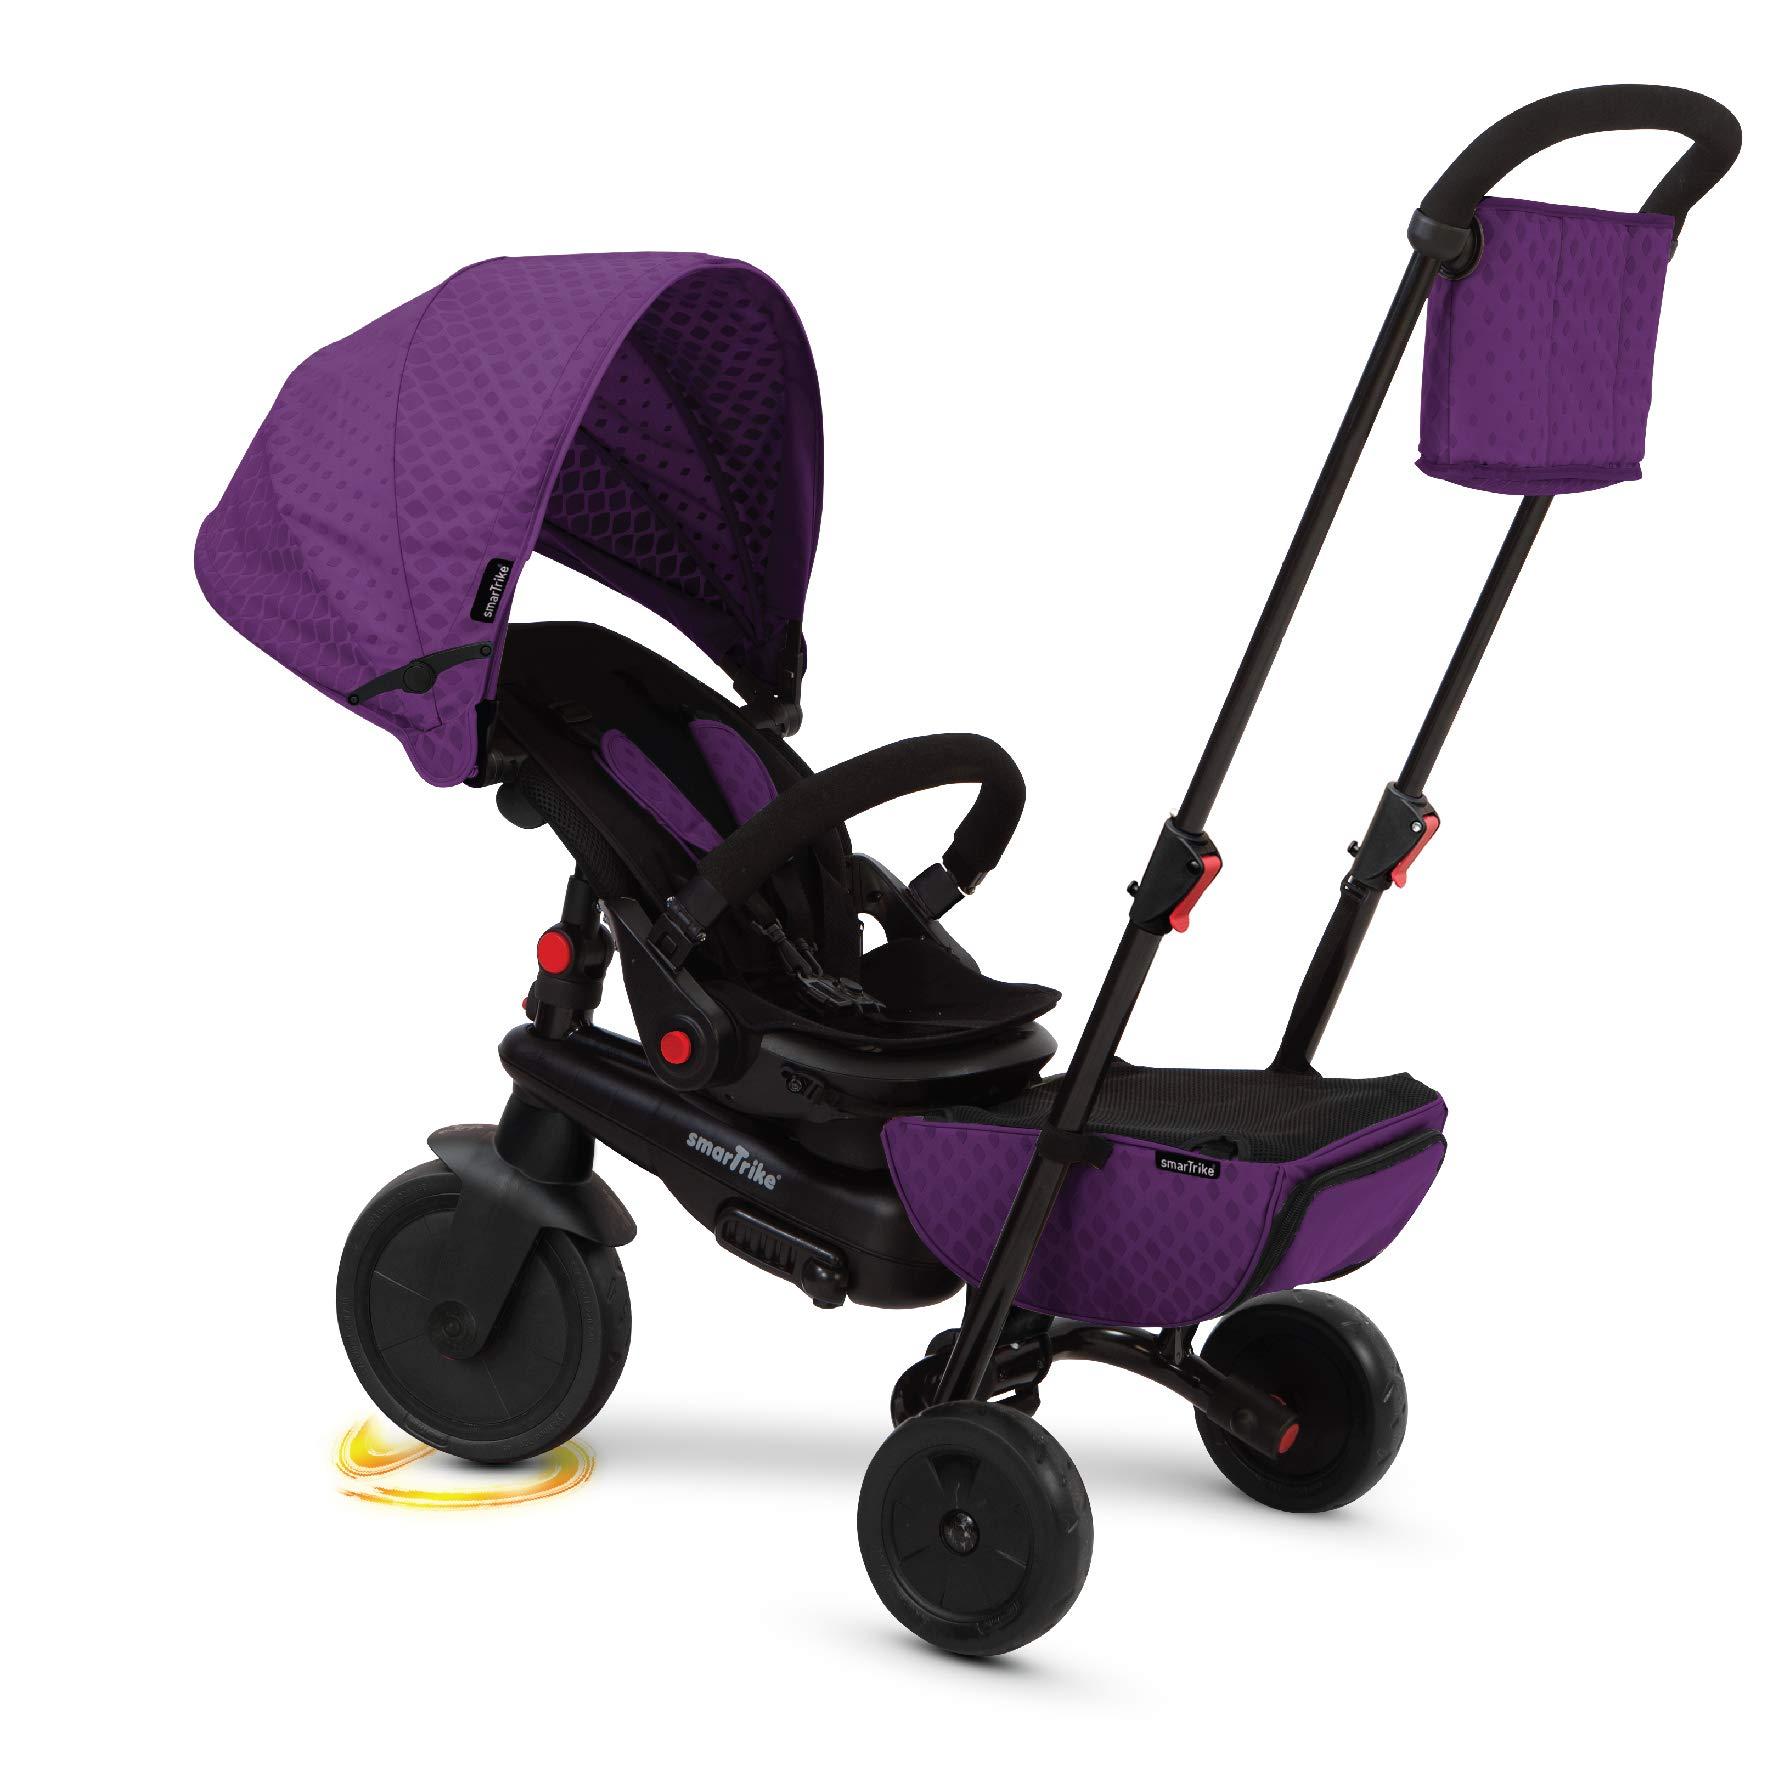 smarTrike 5500100 Smartfold 700 Folding Baby Tricycle, Purple